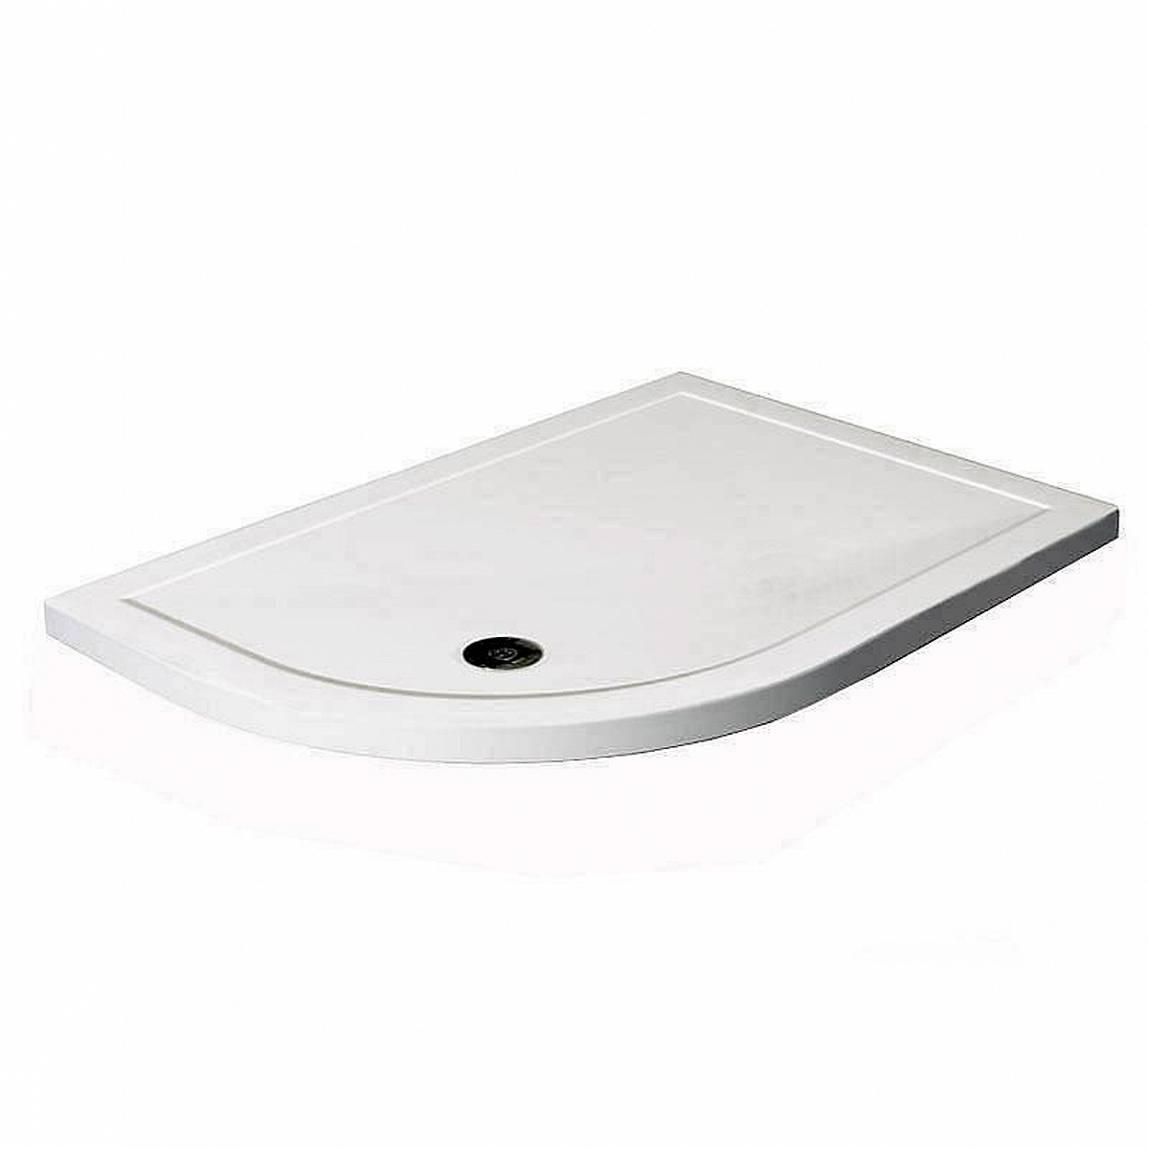 Image of Offset Quadrant Stone Shower Tray 1200 x 800 LH